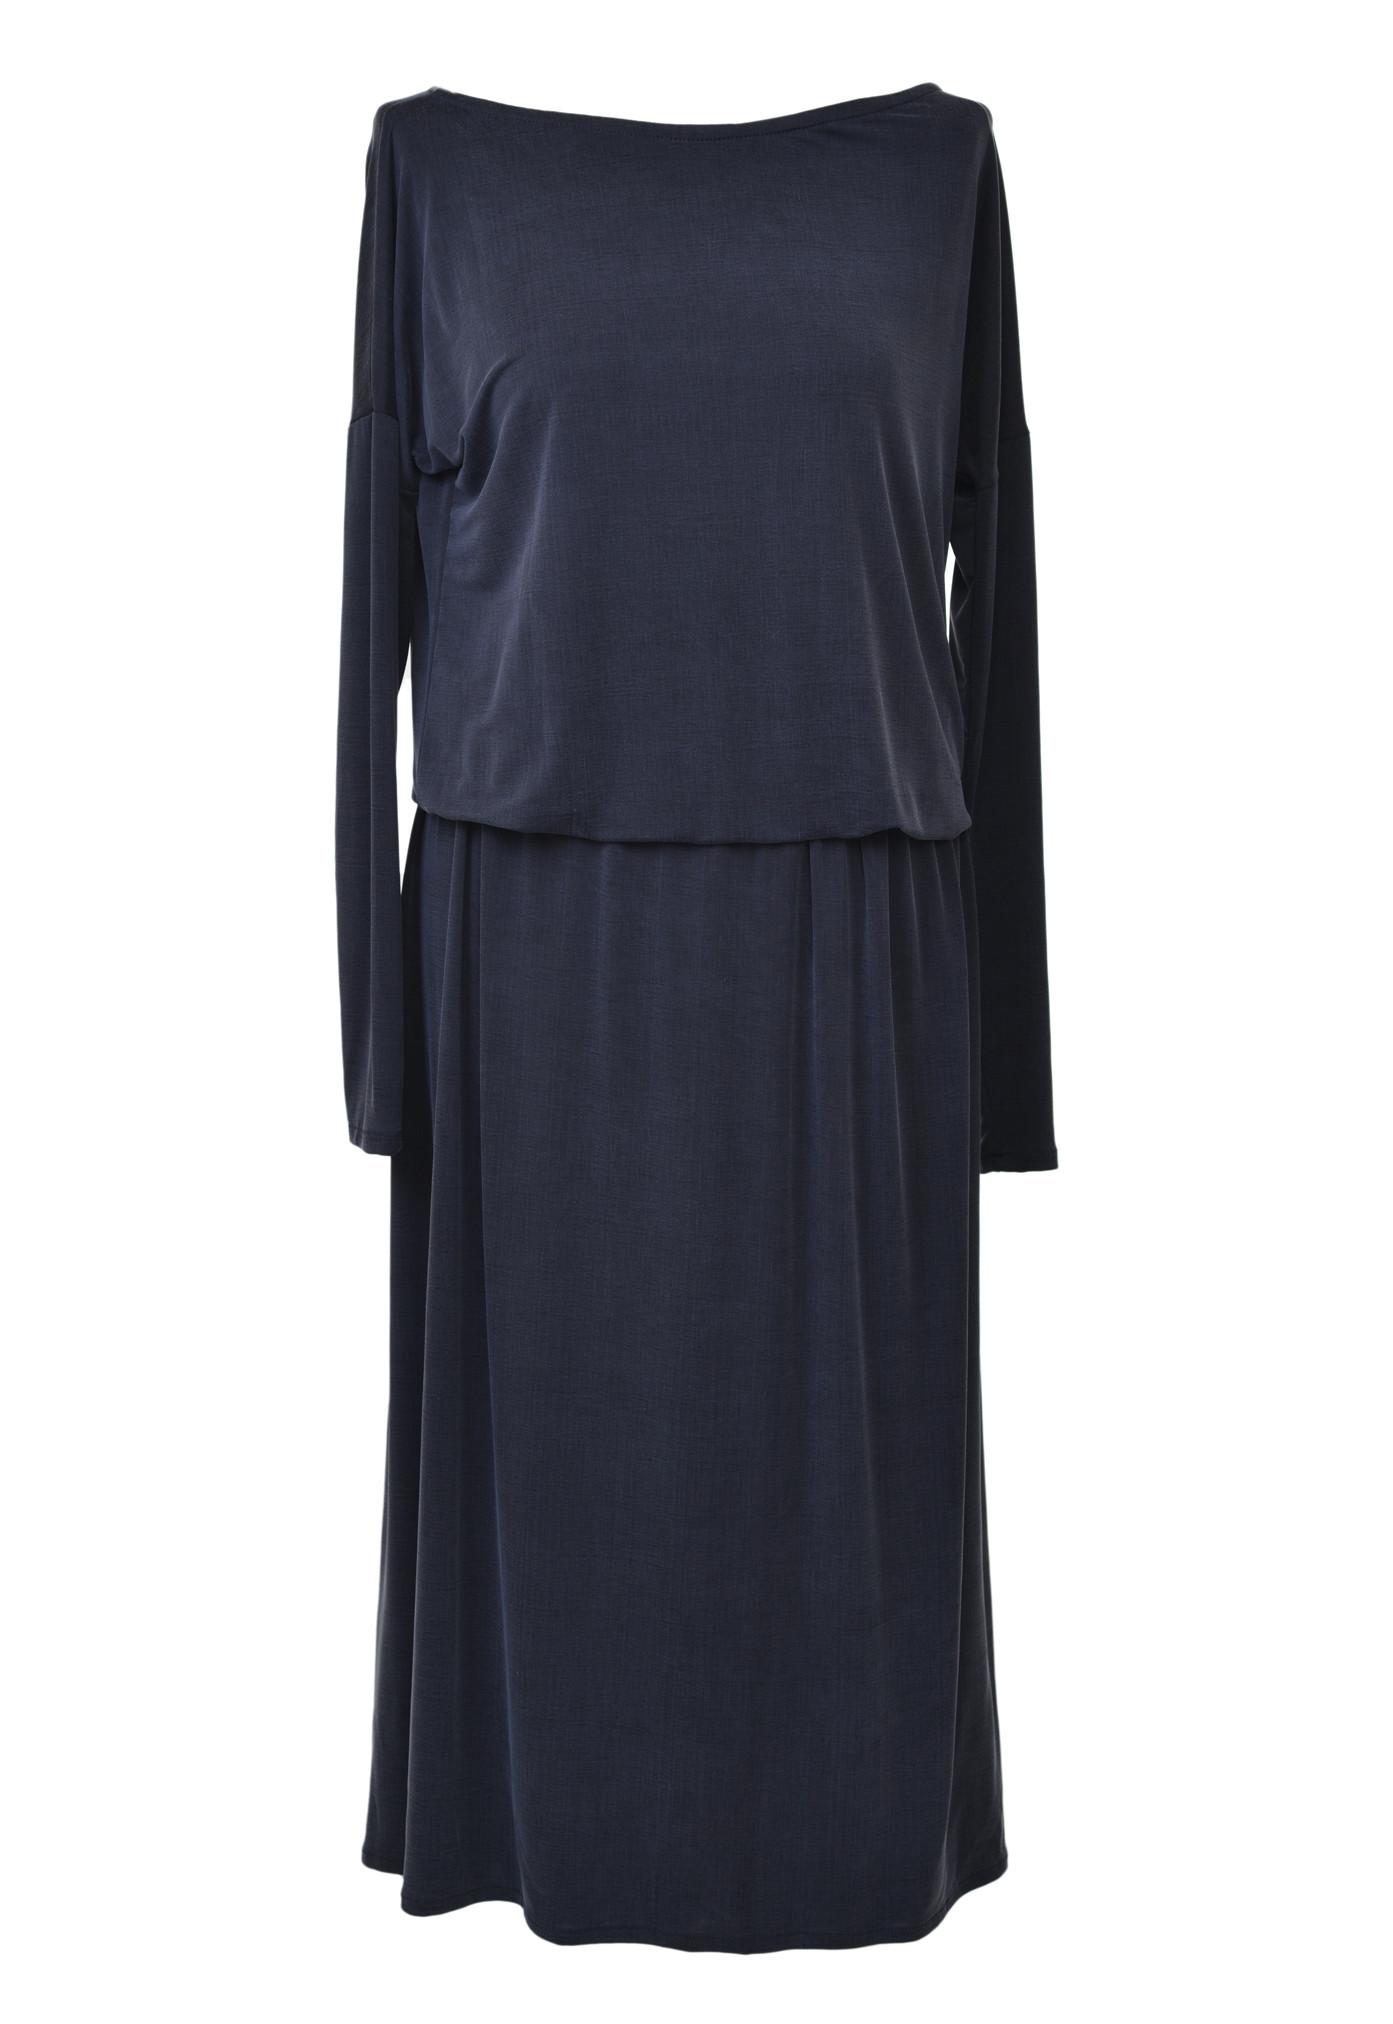 Sukienka Midi Cupro Carbon WOMAN  czarna sukienka midi mała czarna polski projektant - The Same